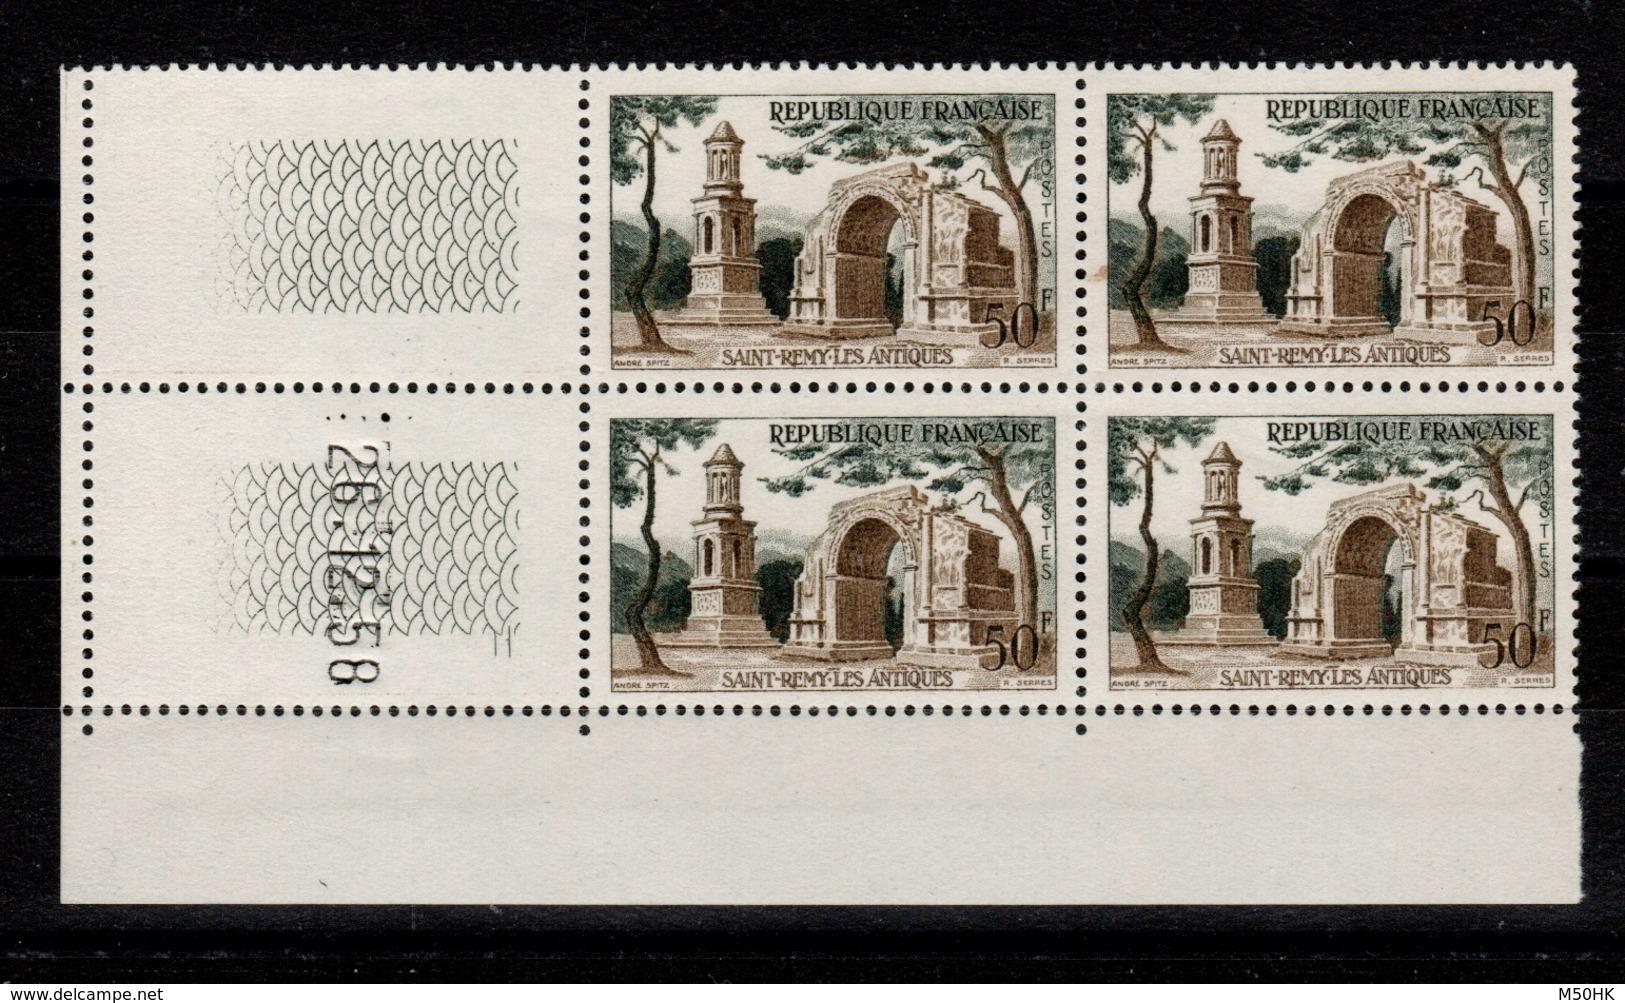 Coin Daté - YV 1130 N** St Remy Coin Daté Du 26.12.58 - 1950-1959